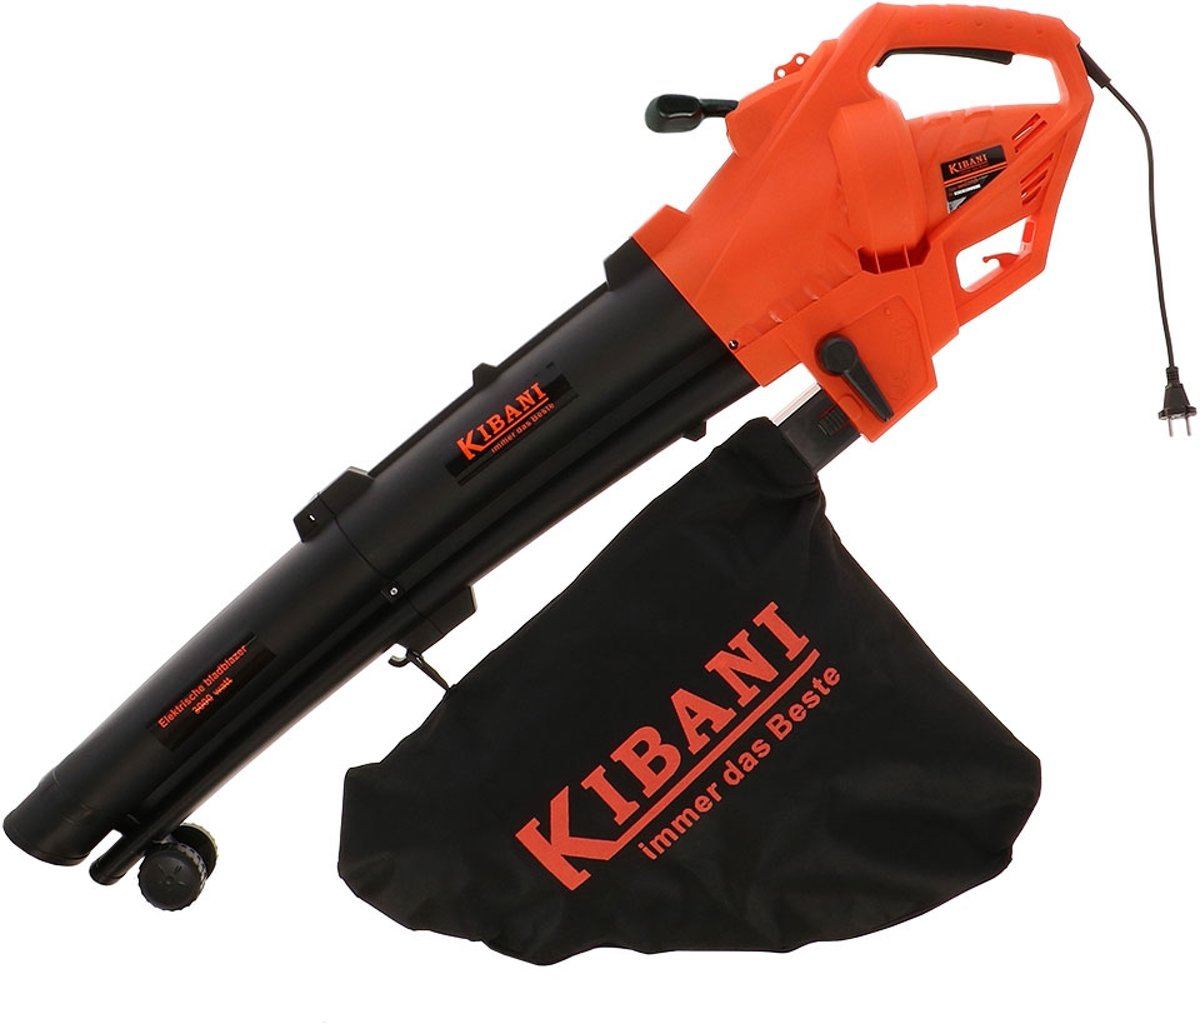 Kibani elektrische bladblazer 3000 watt